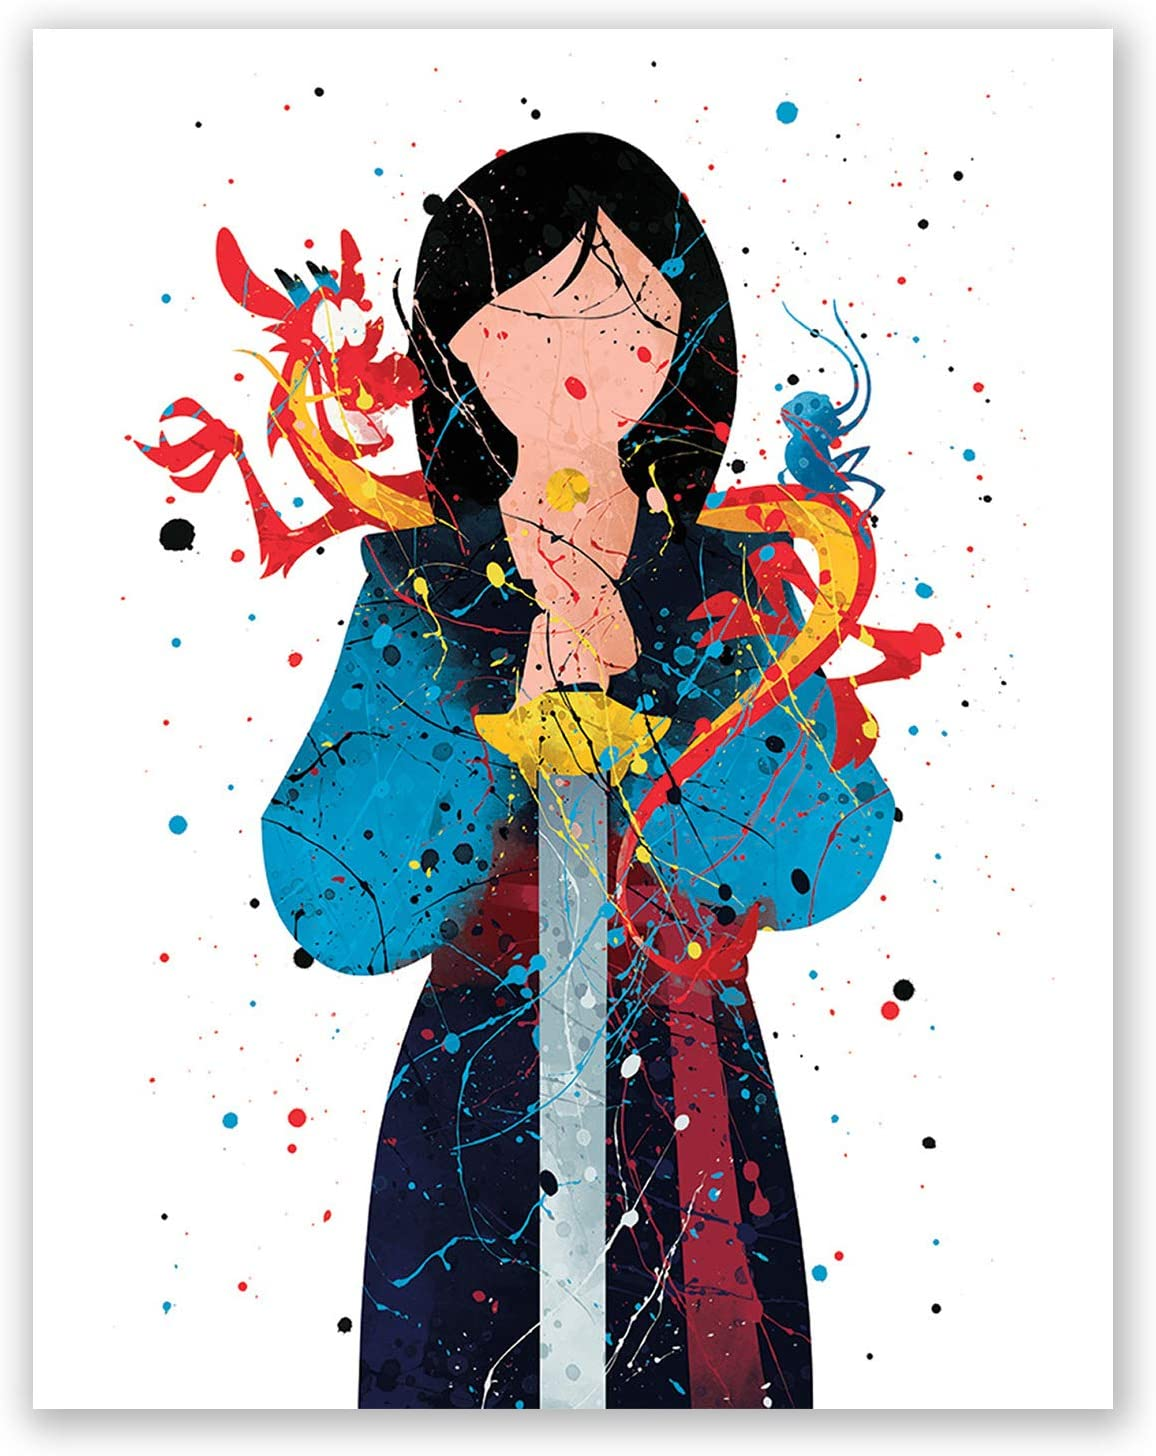 Amazon Com Mulan Poster Print Princess Wall Art Girls Bedroom Decor Birthday Party Decoration Idea Nursery Theme Picture 8x10 Posters Prints